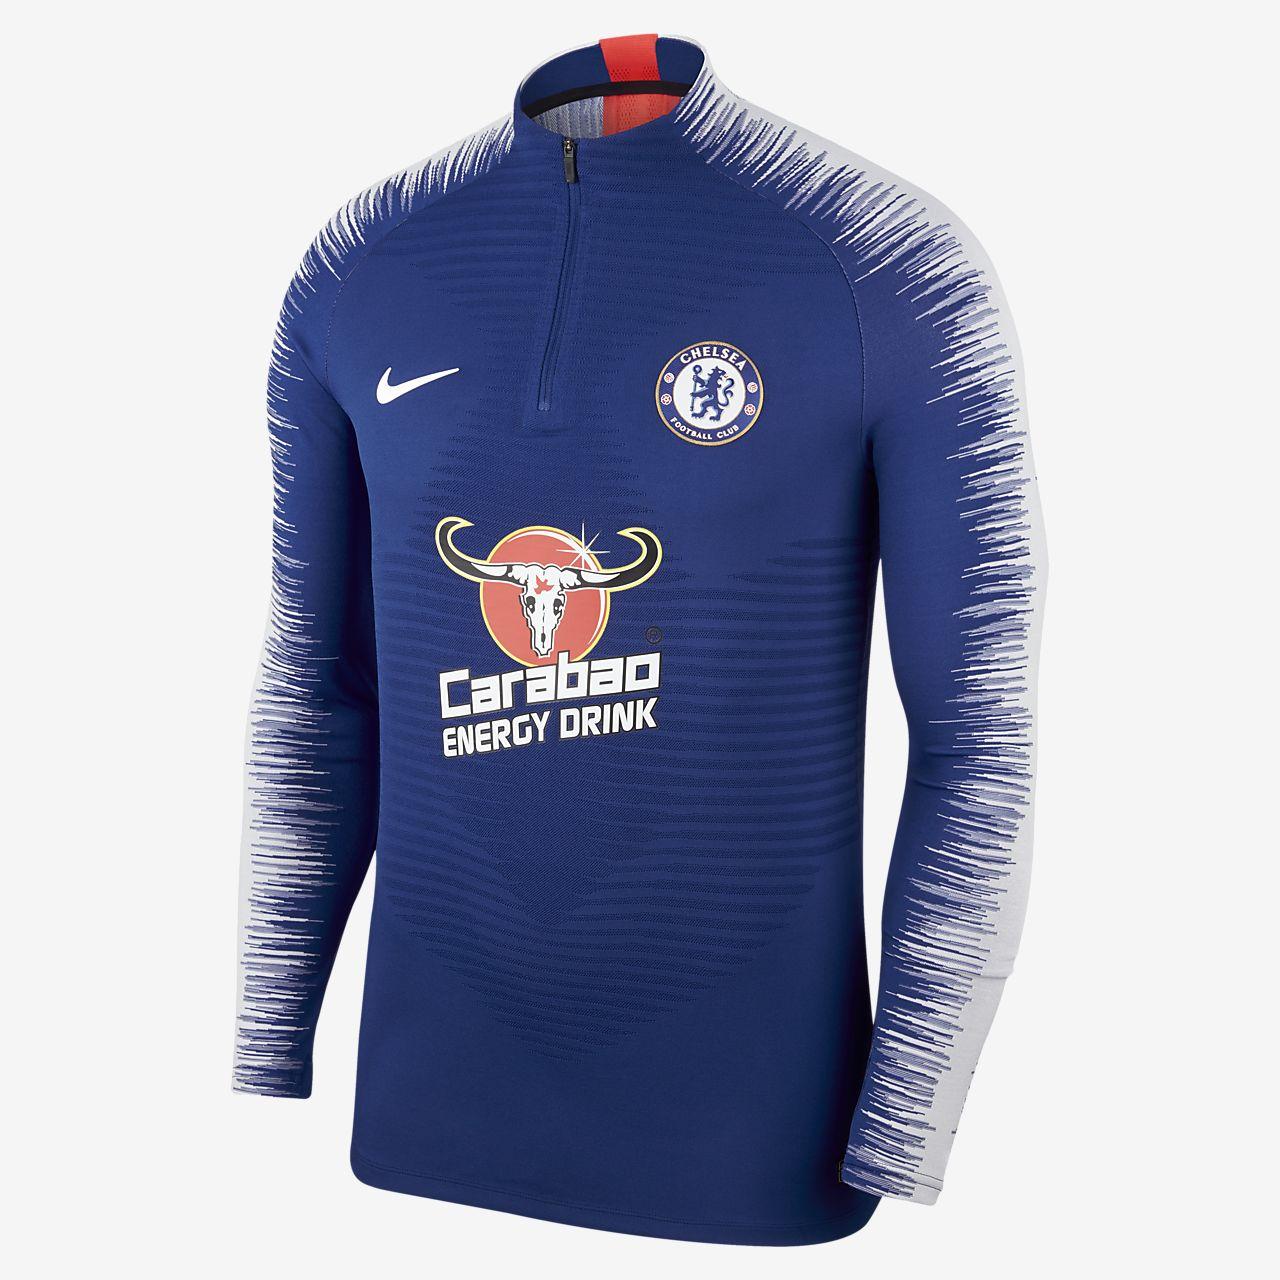 Chelsea FC VaporKnit Strike Drill Camiseta de fútbol de manga larga - Hombre 78da03daa2ed6